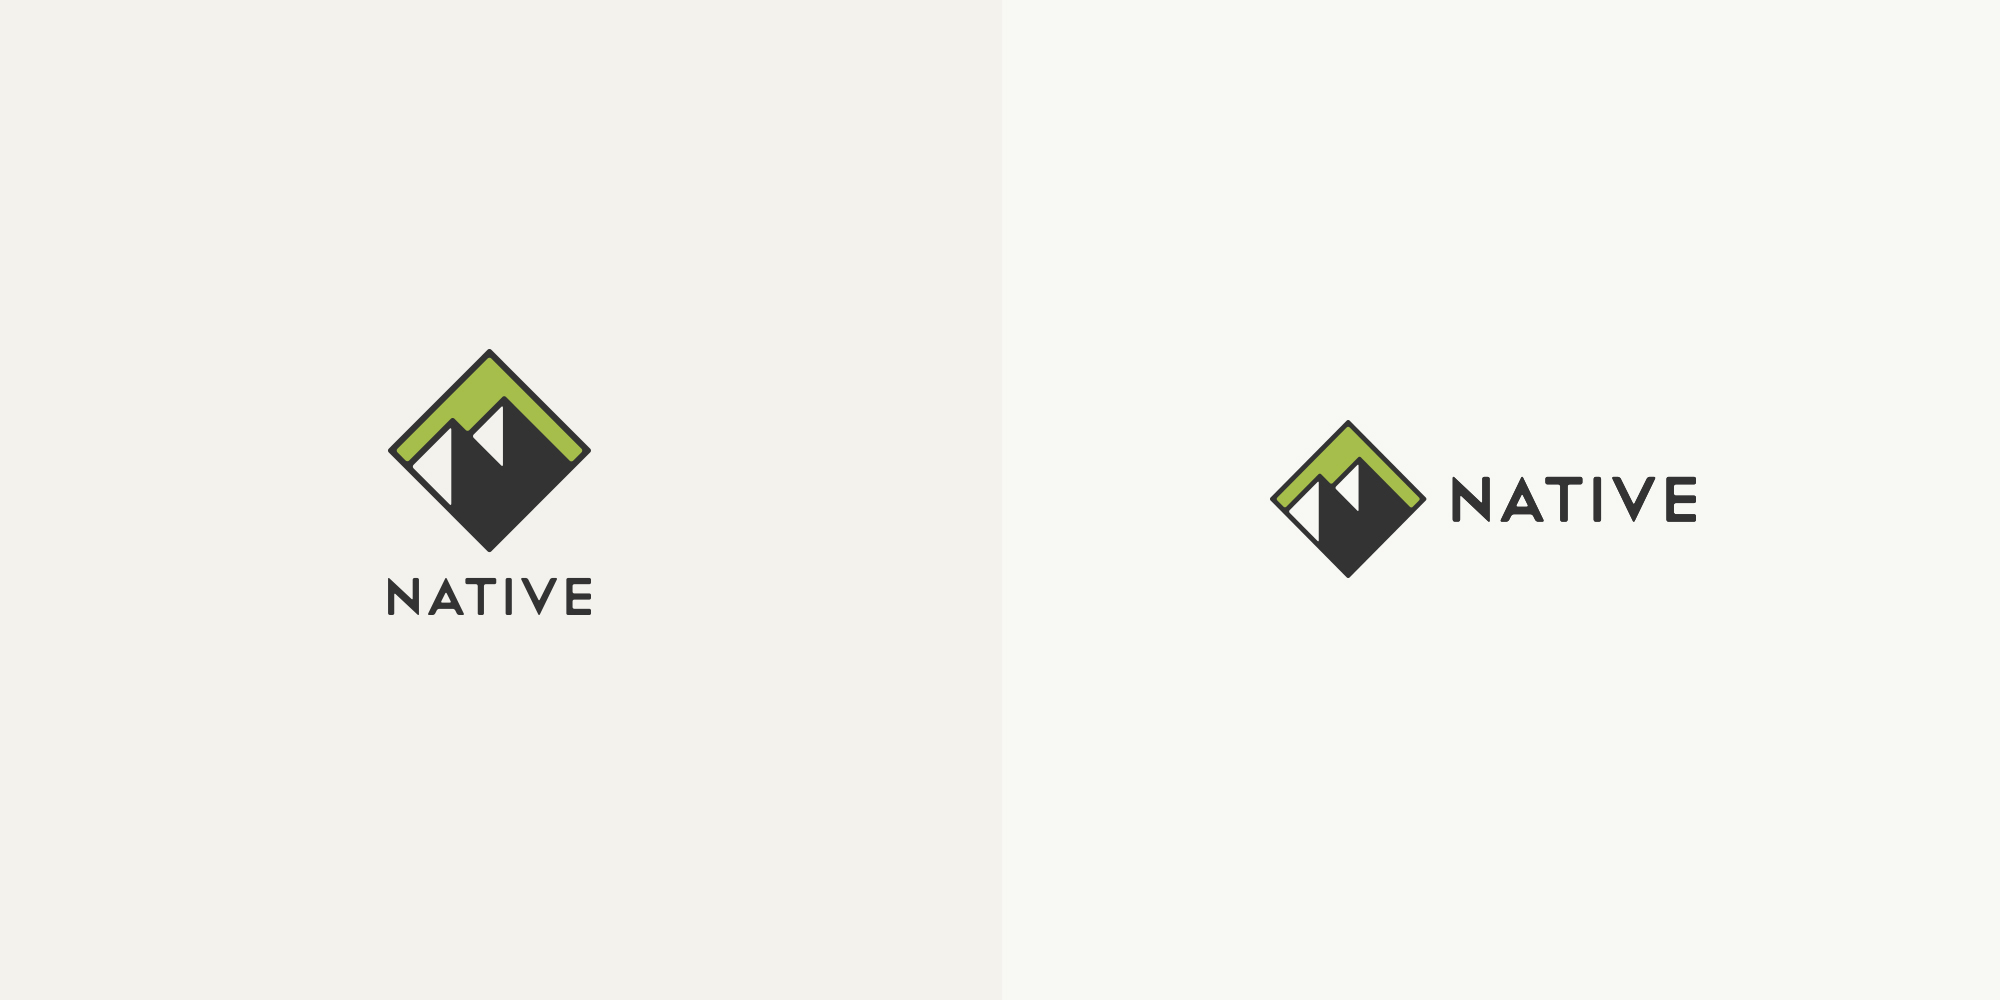 Native_brandidentity_websitedesign_julieeckertdesign_2-3.jpg